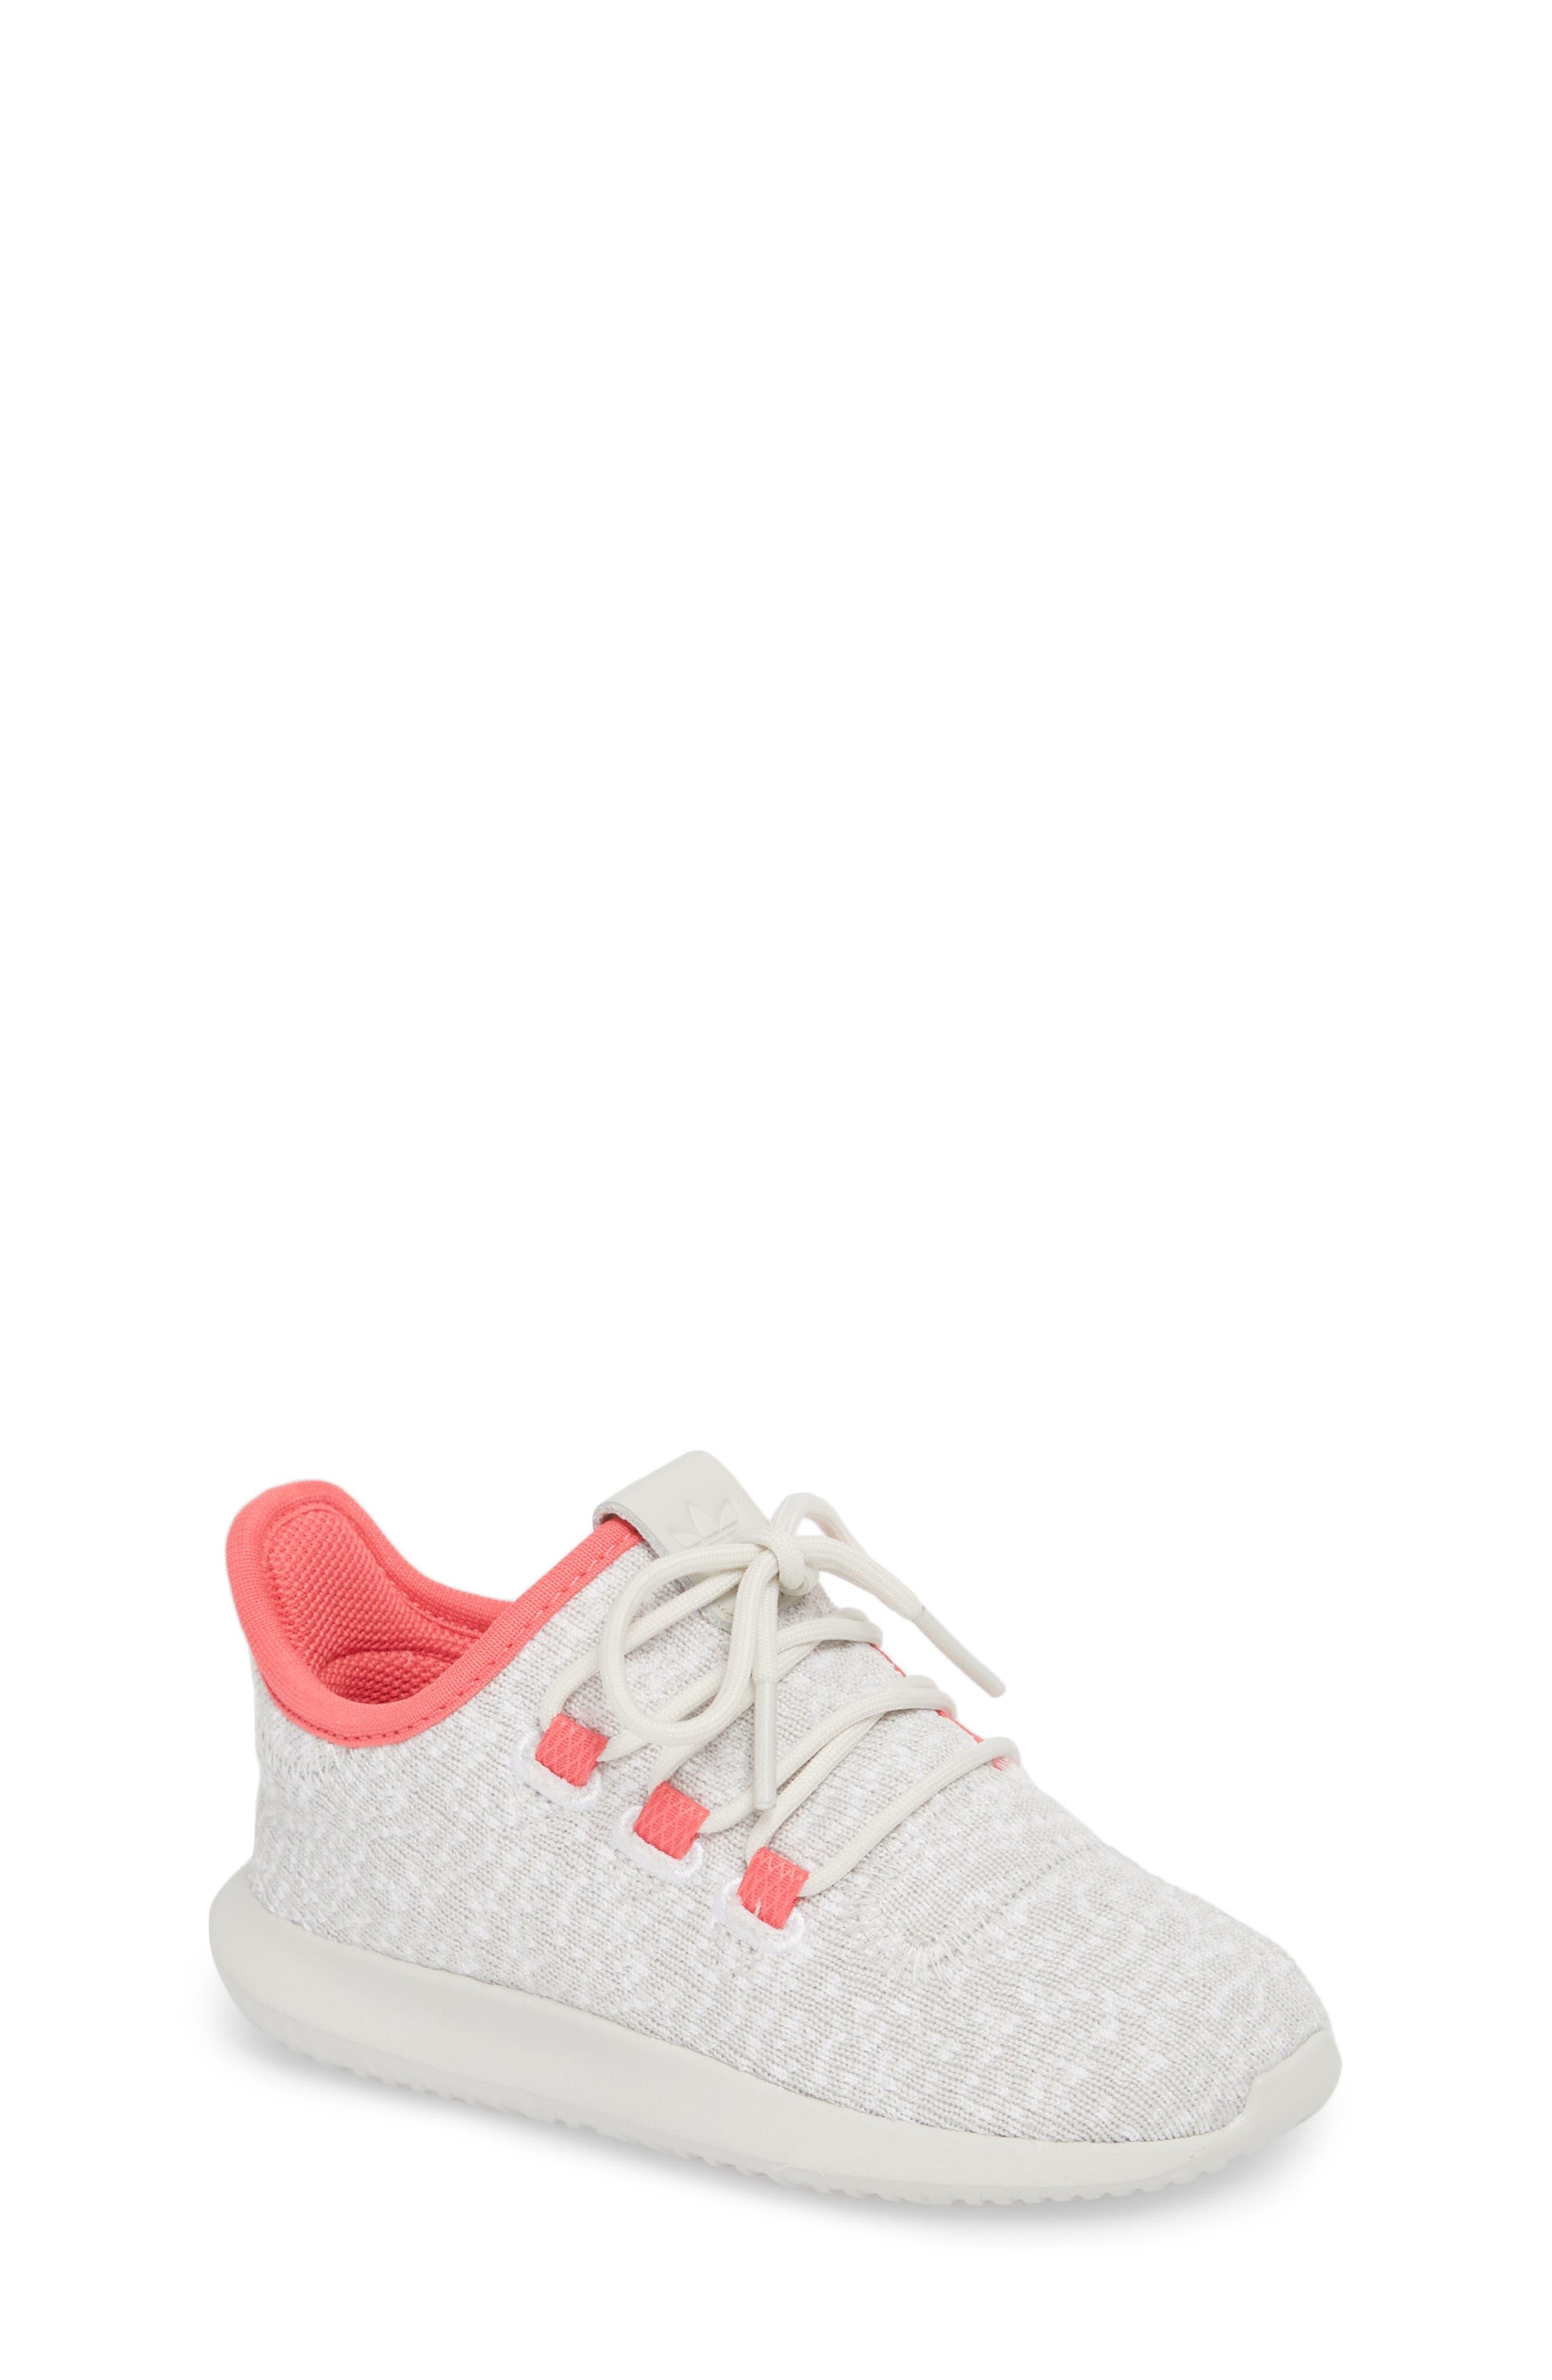 Tubular Shadow Sneaker,                             Main thumbnail 1, color,                             Grey/ Ash Pink/ White